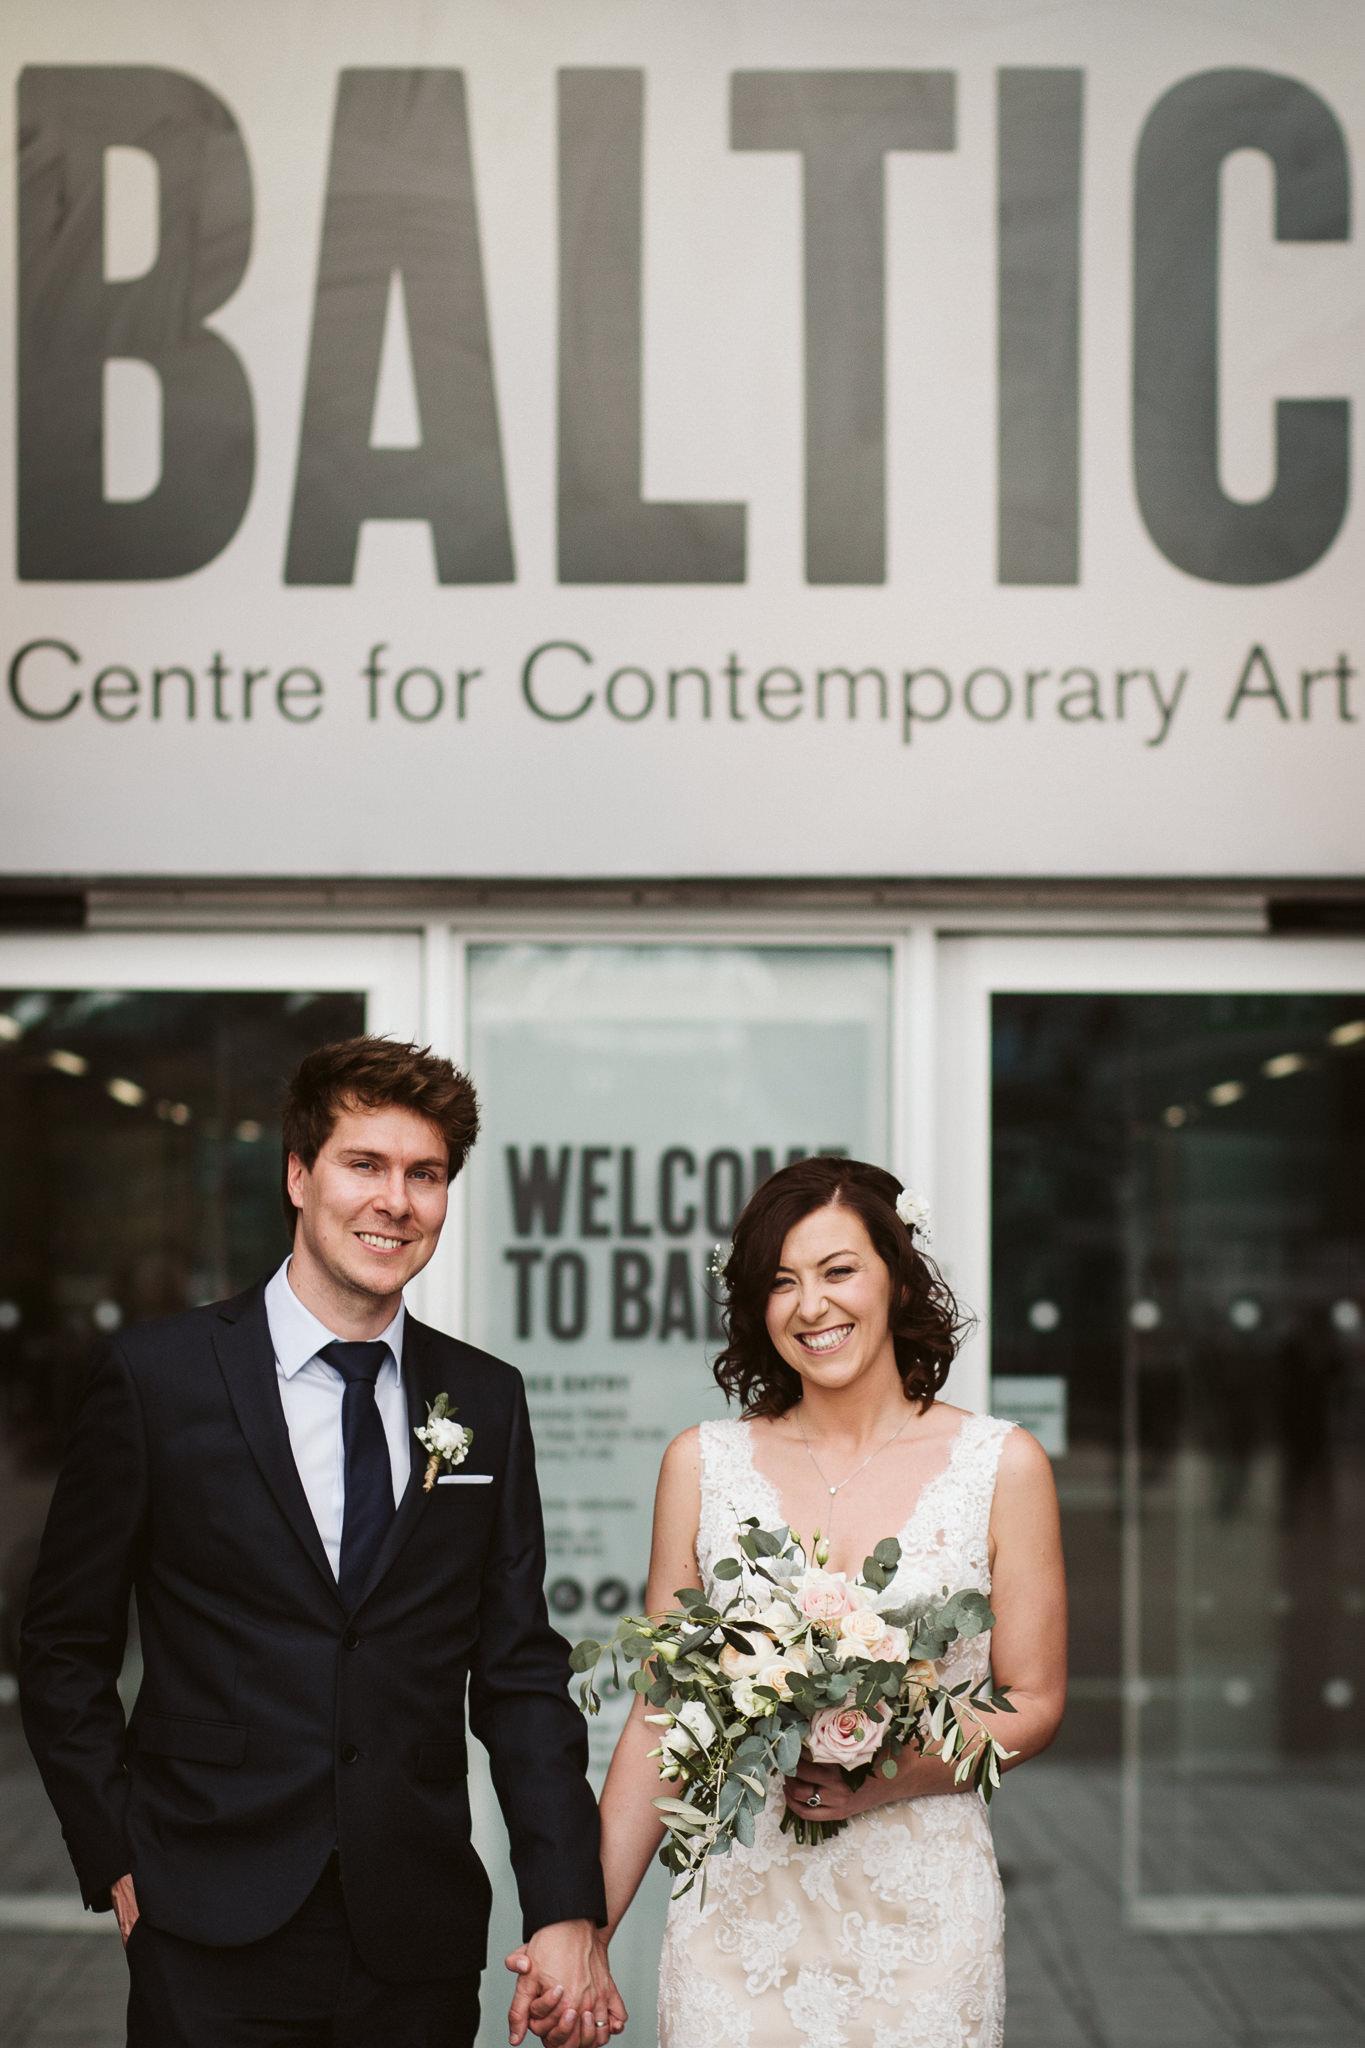 baltic-wedding-margarita-hope (39).jpg